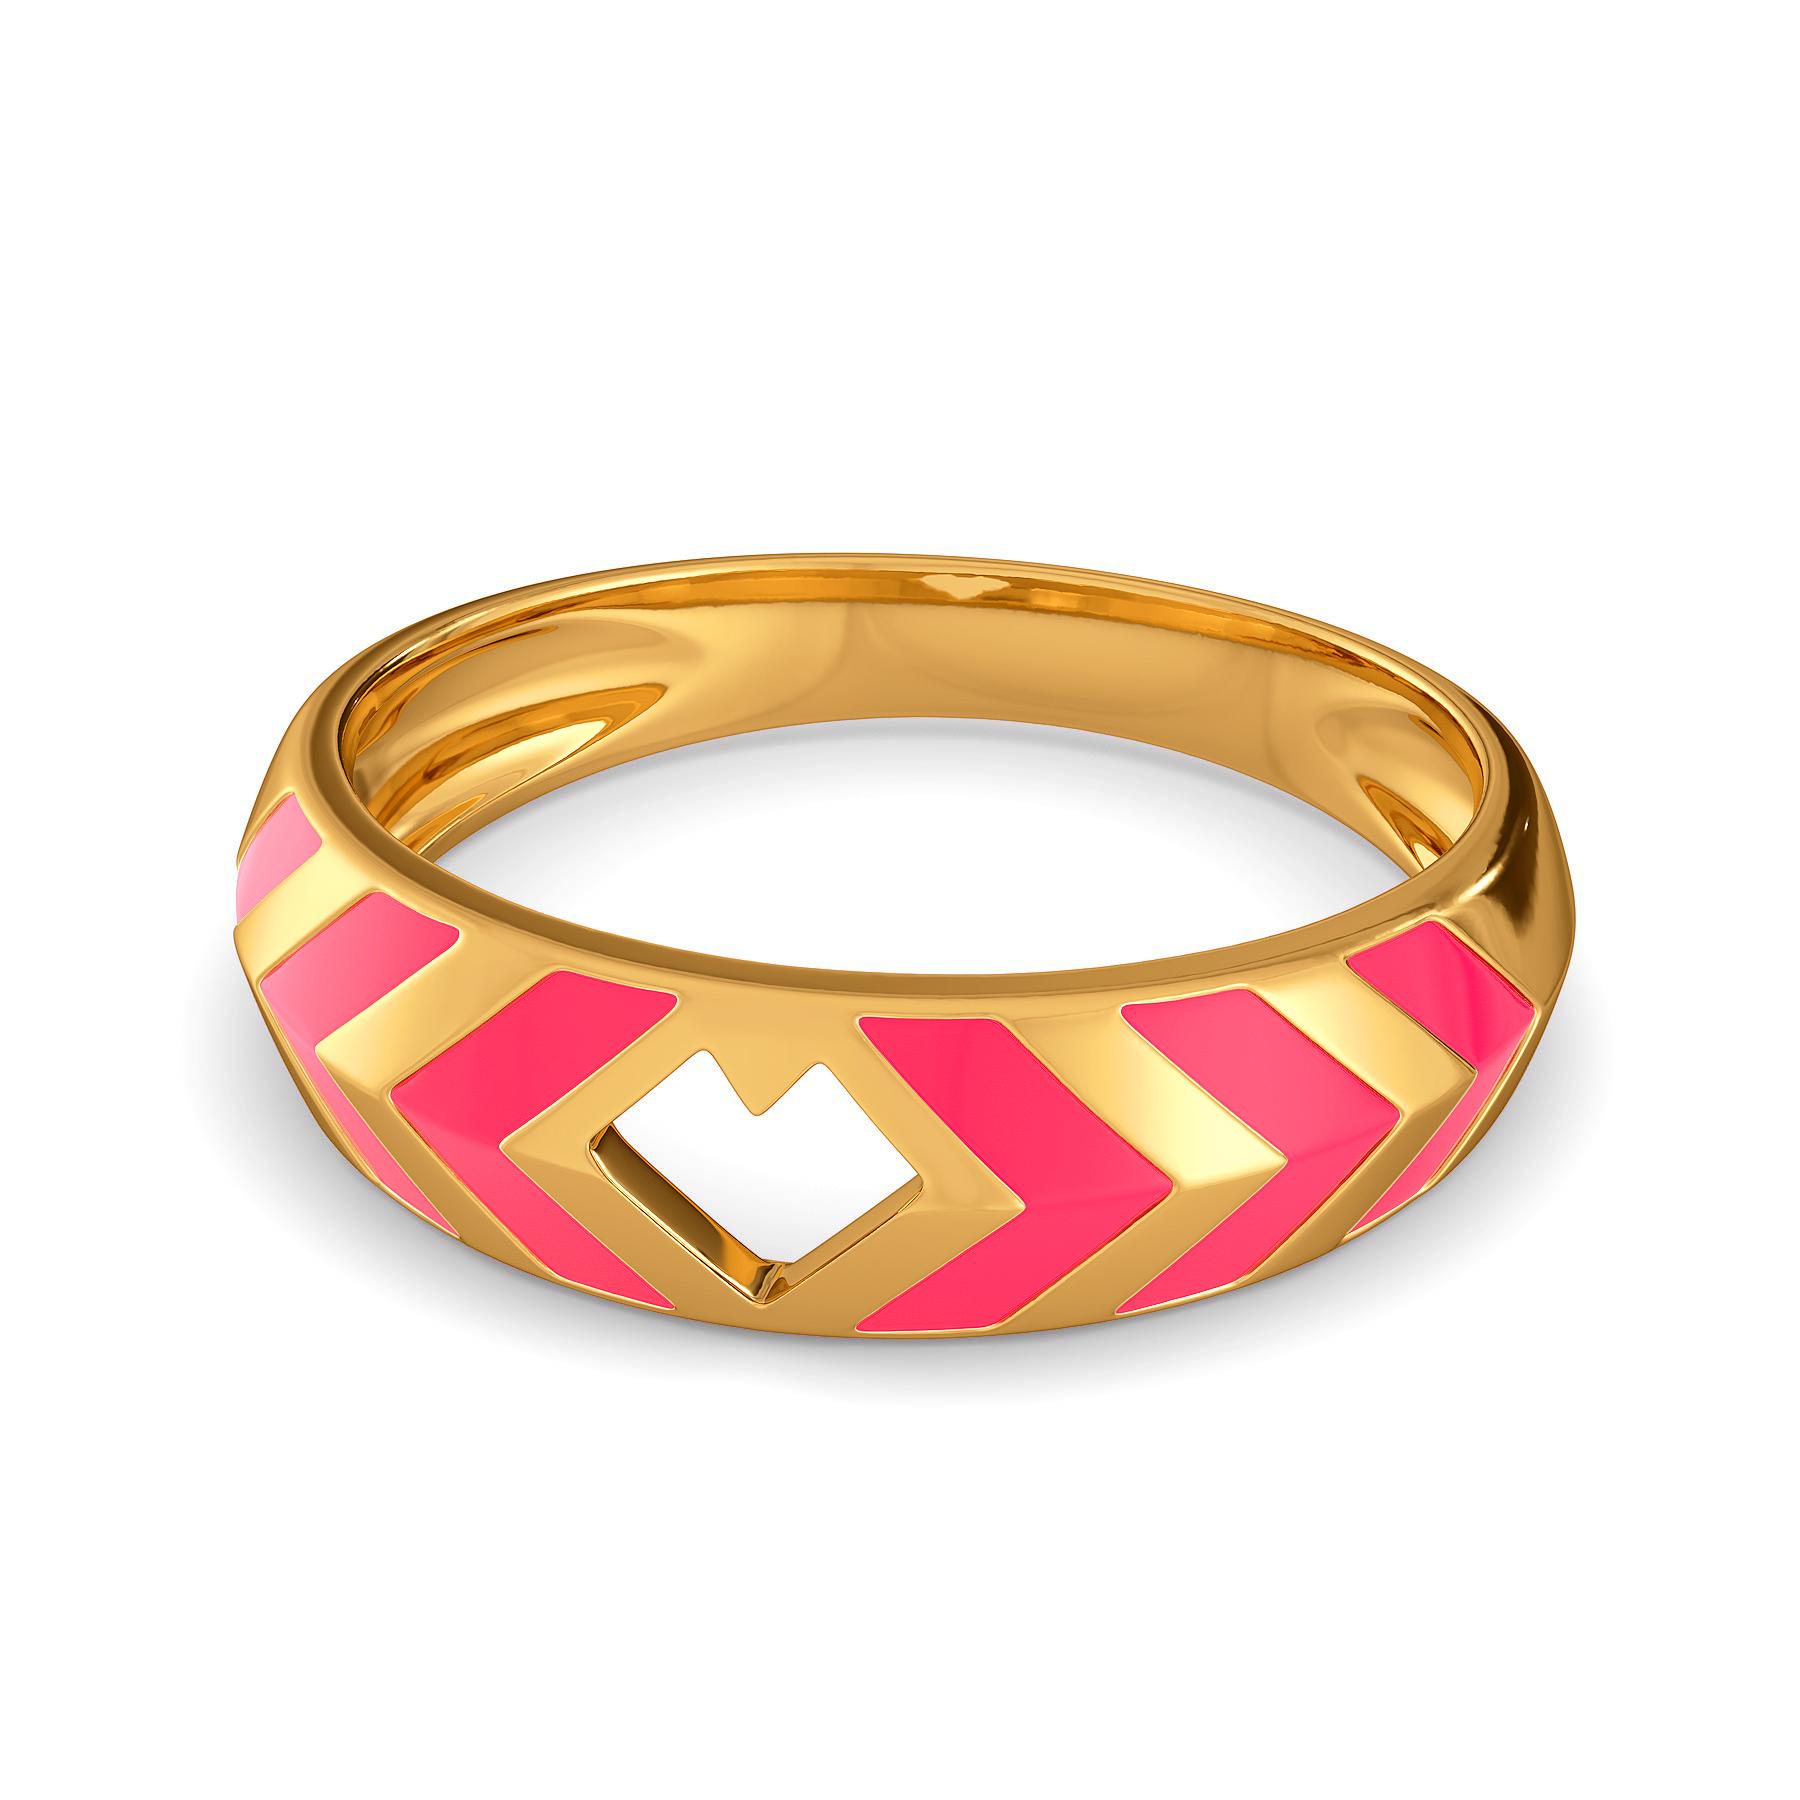 Fuscia Fondness Gold Rings